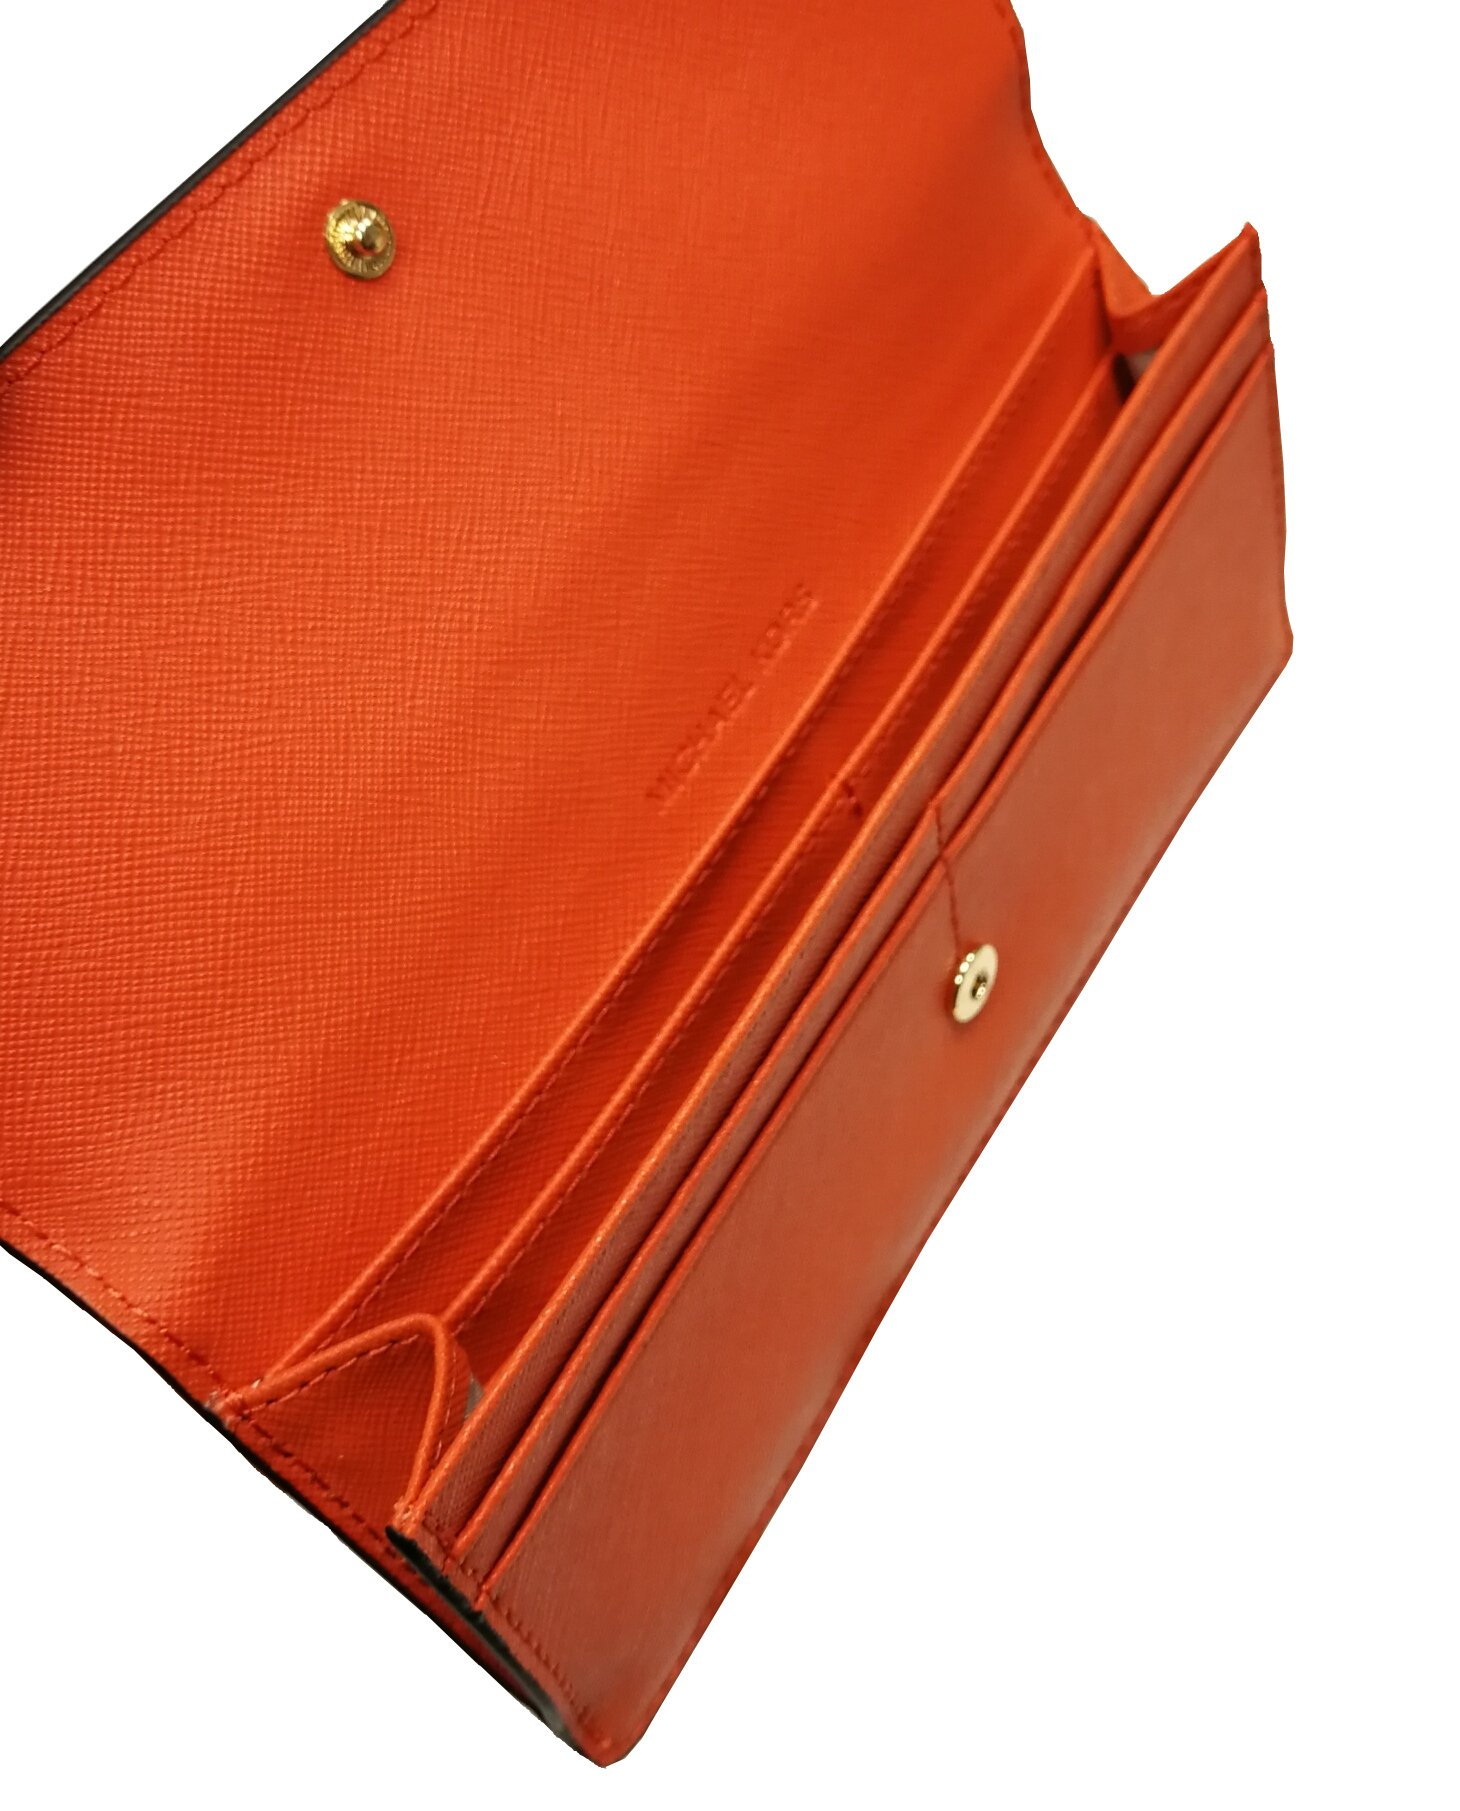 Michael Kors Jet Set Travel Flat Saffiano Leather Wallet (Tangerine Orange)